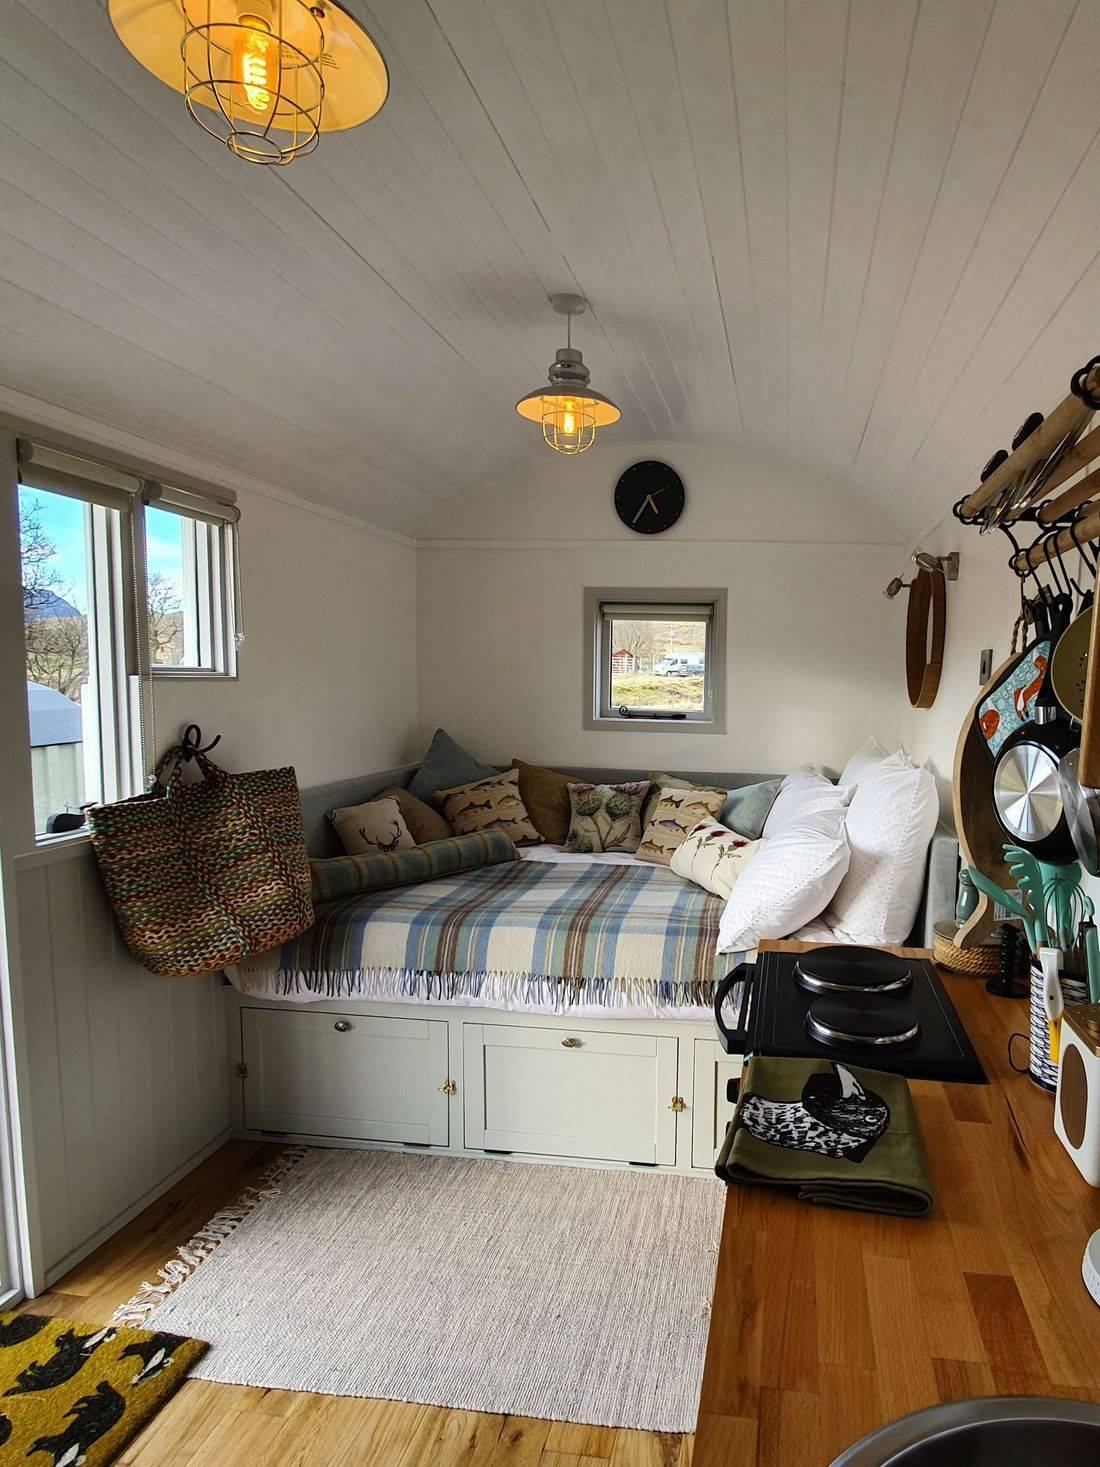 Luxurious comfort inside well equipped Shepherds Hut